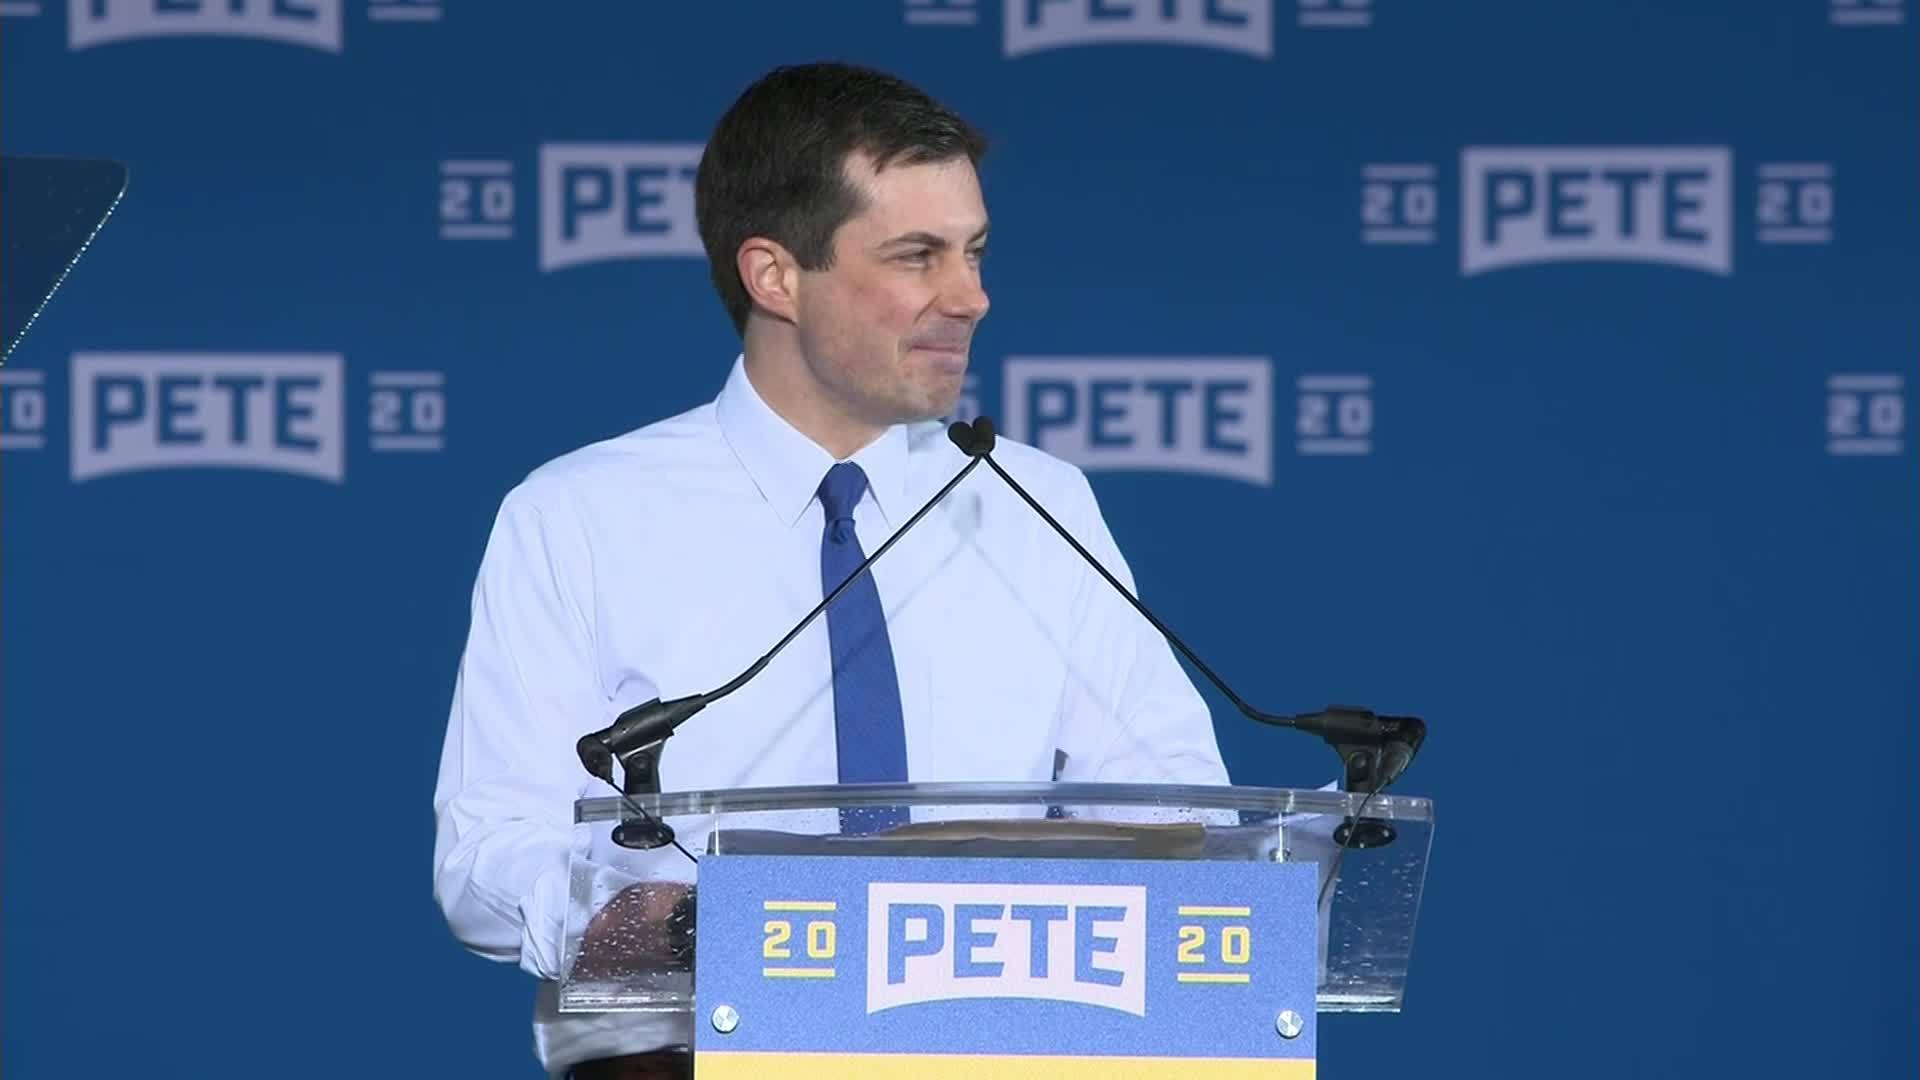 Indiana_Mayor_Pete_Buttigieg_joins_2020__2_20190414200425